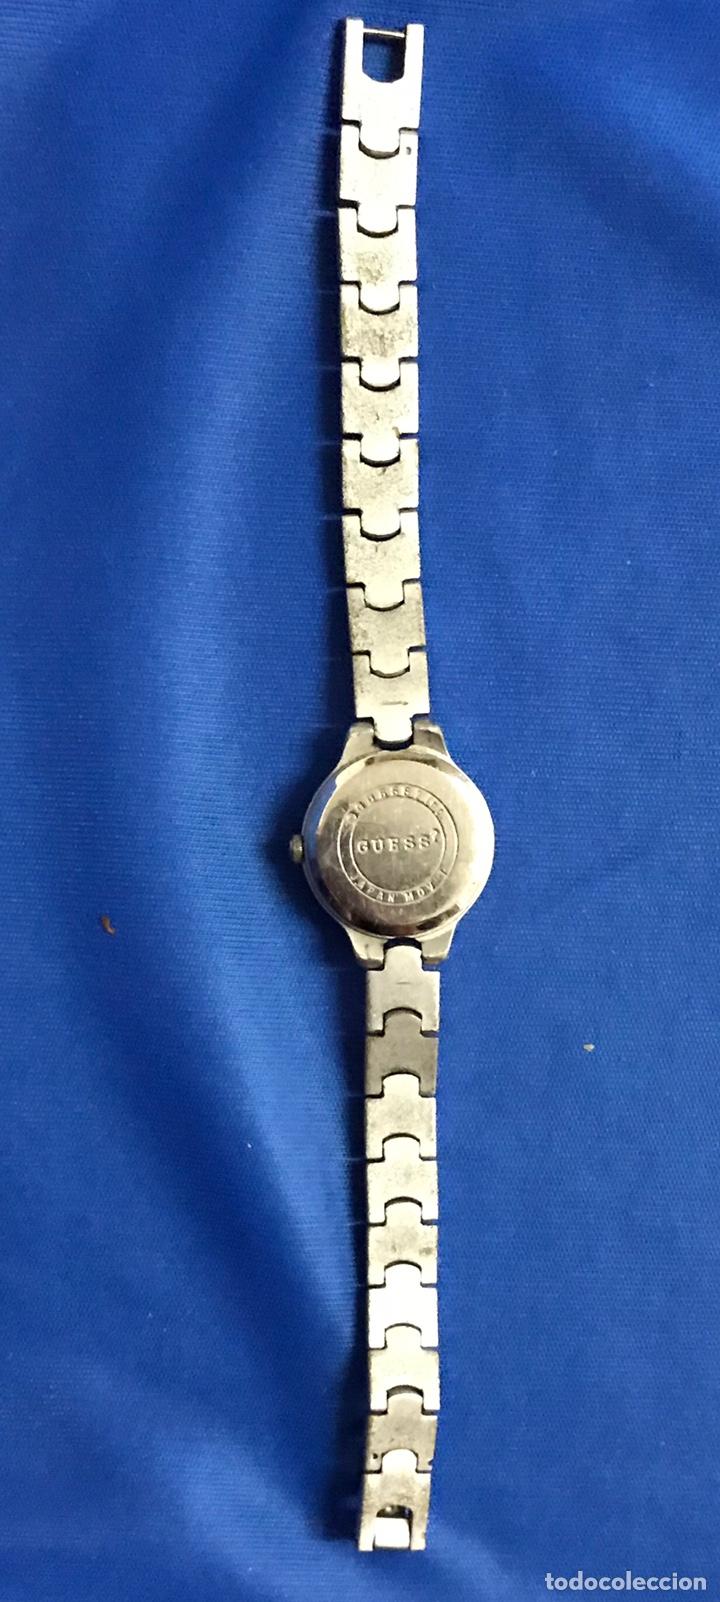 Relojes - Guess: Reloj de mujer, marca Quess original 100 x 100 - Foto 6 - 222805247